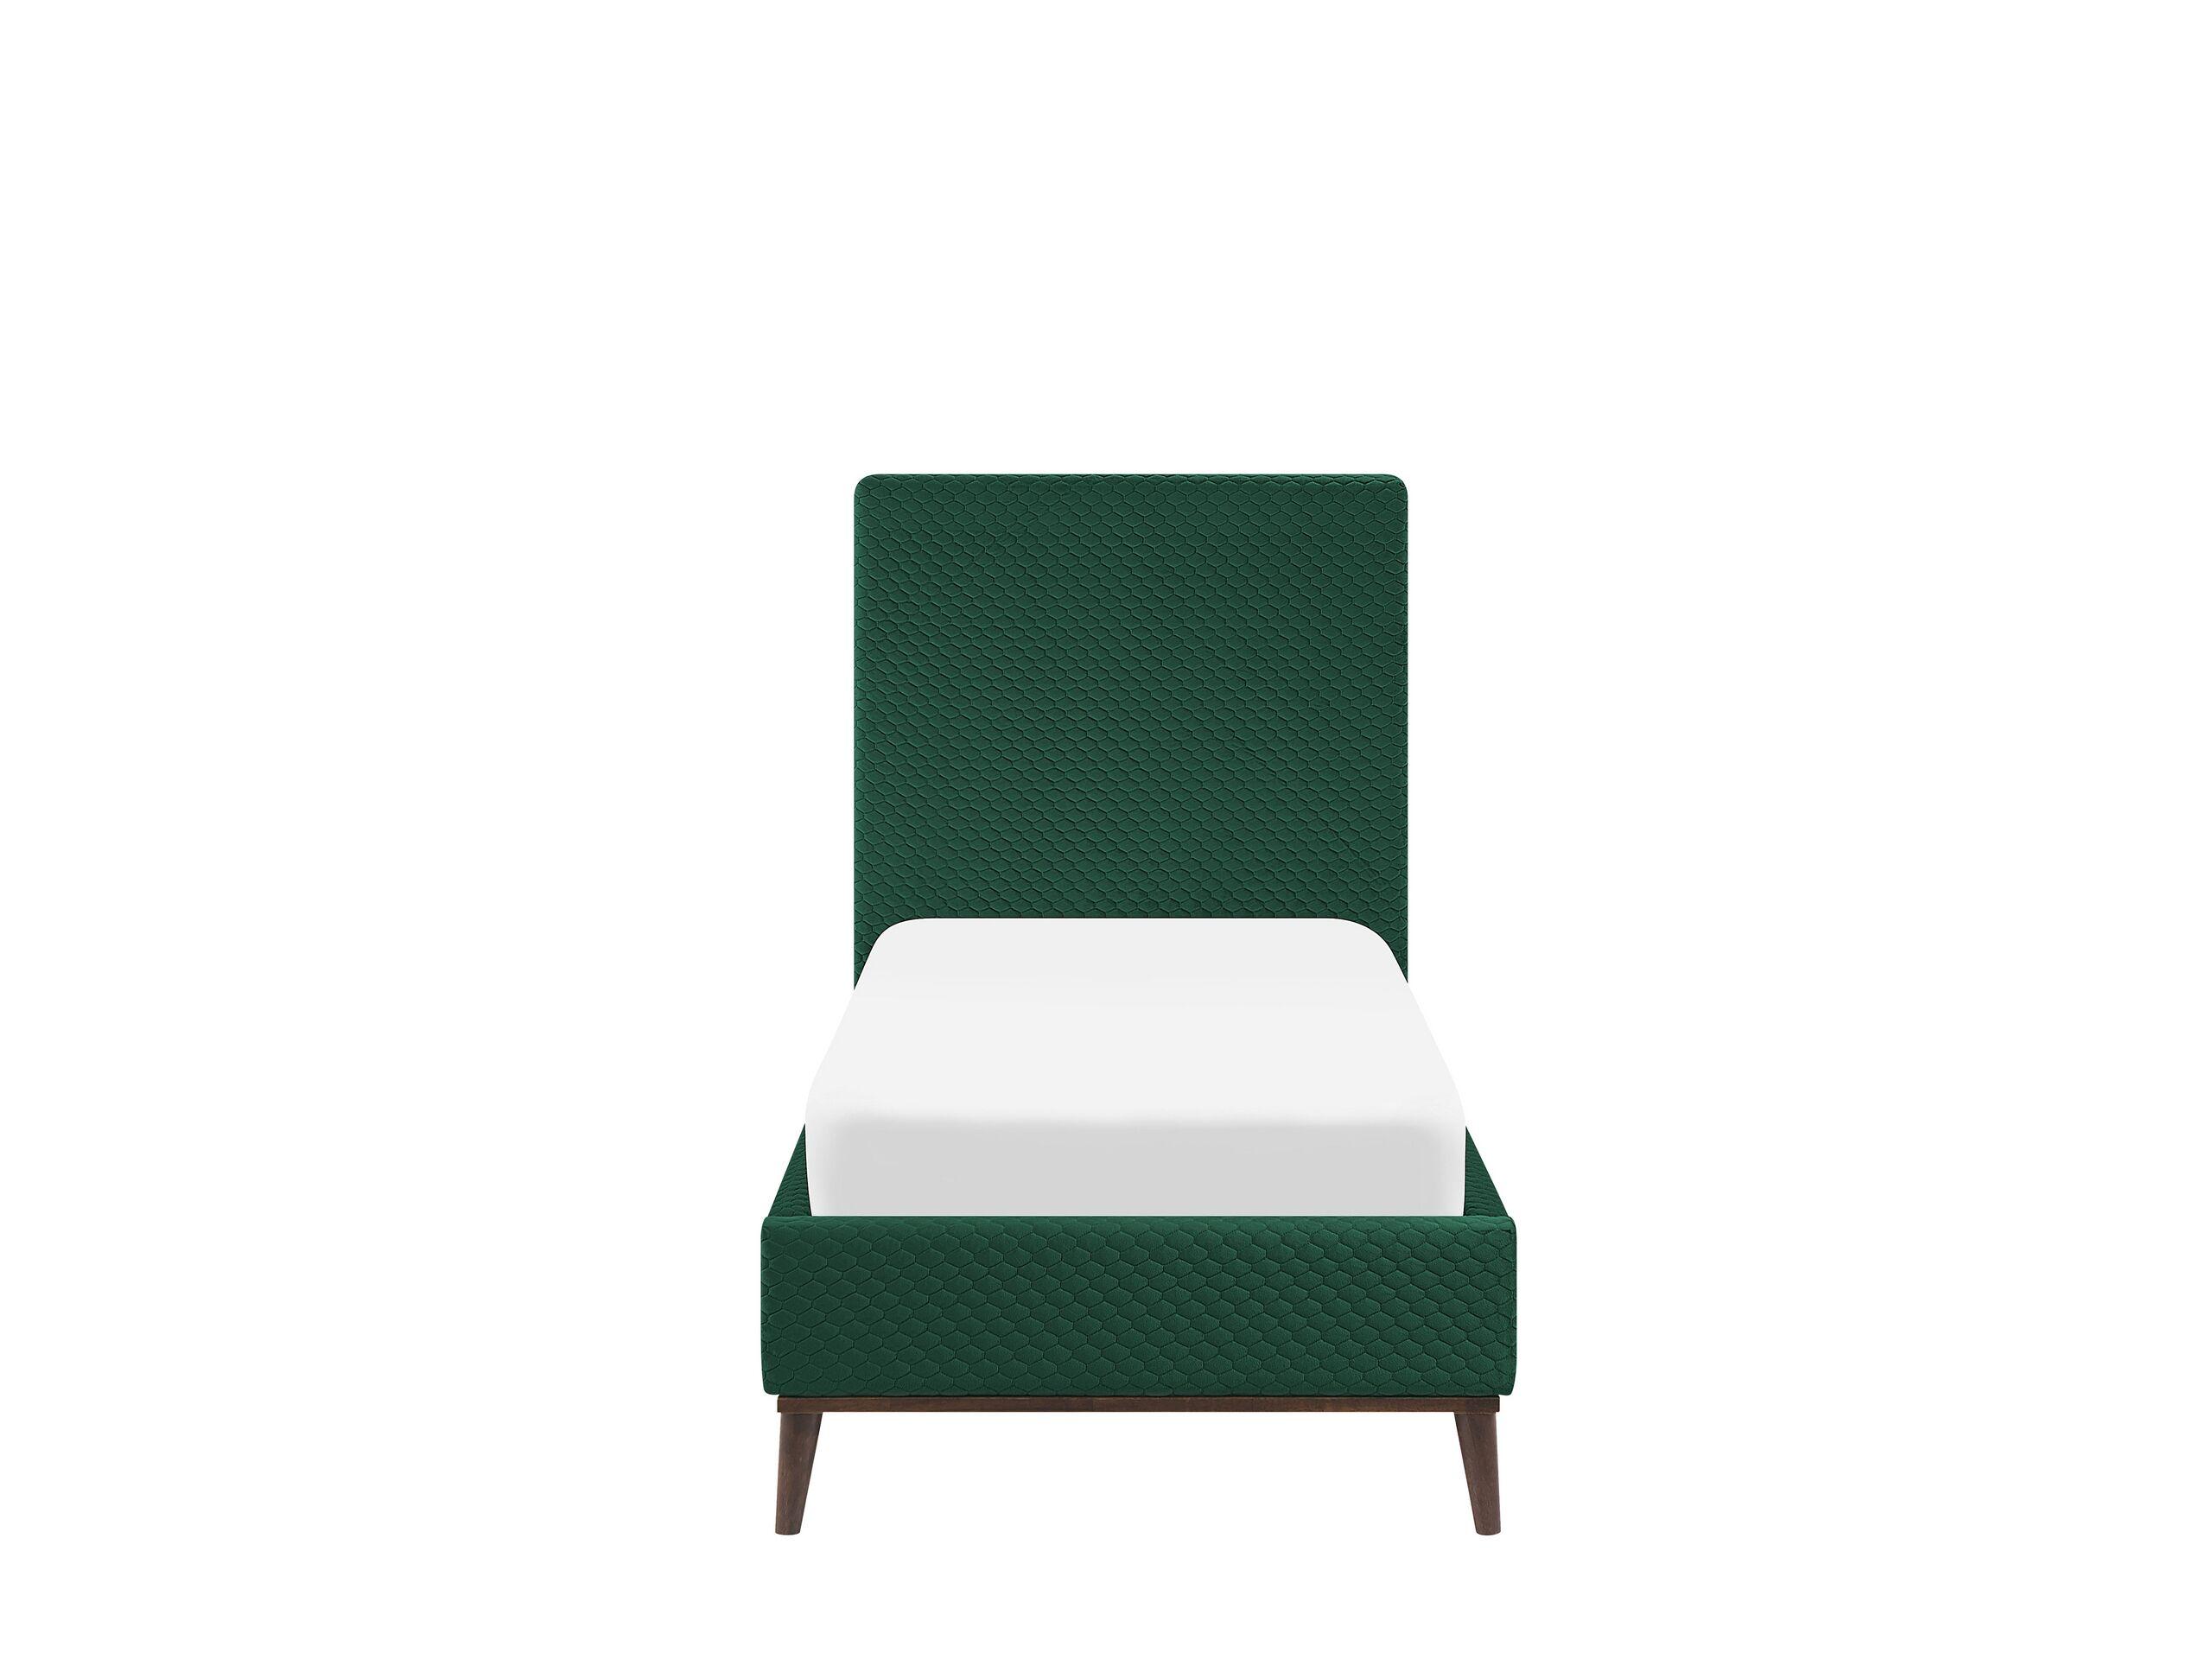 Beliani Lit simple 90 x 200 cm en velours vert foncé